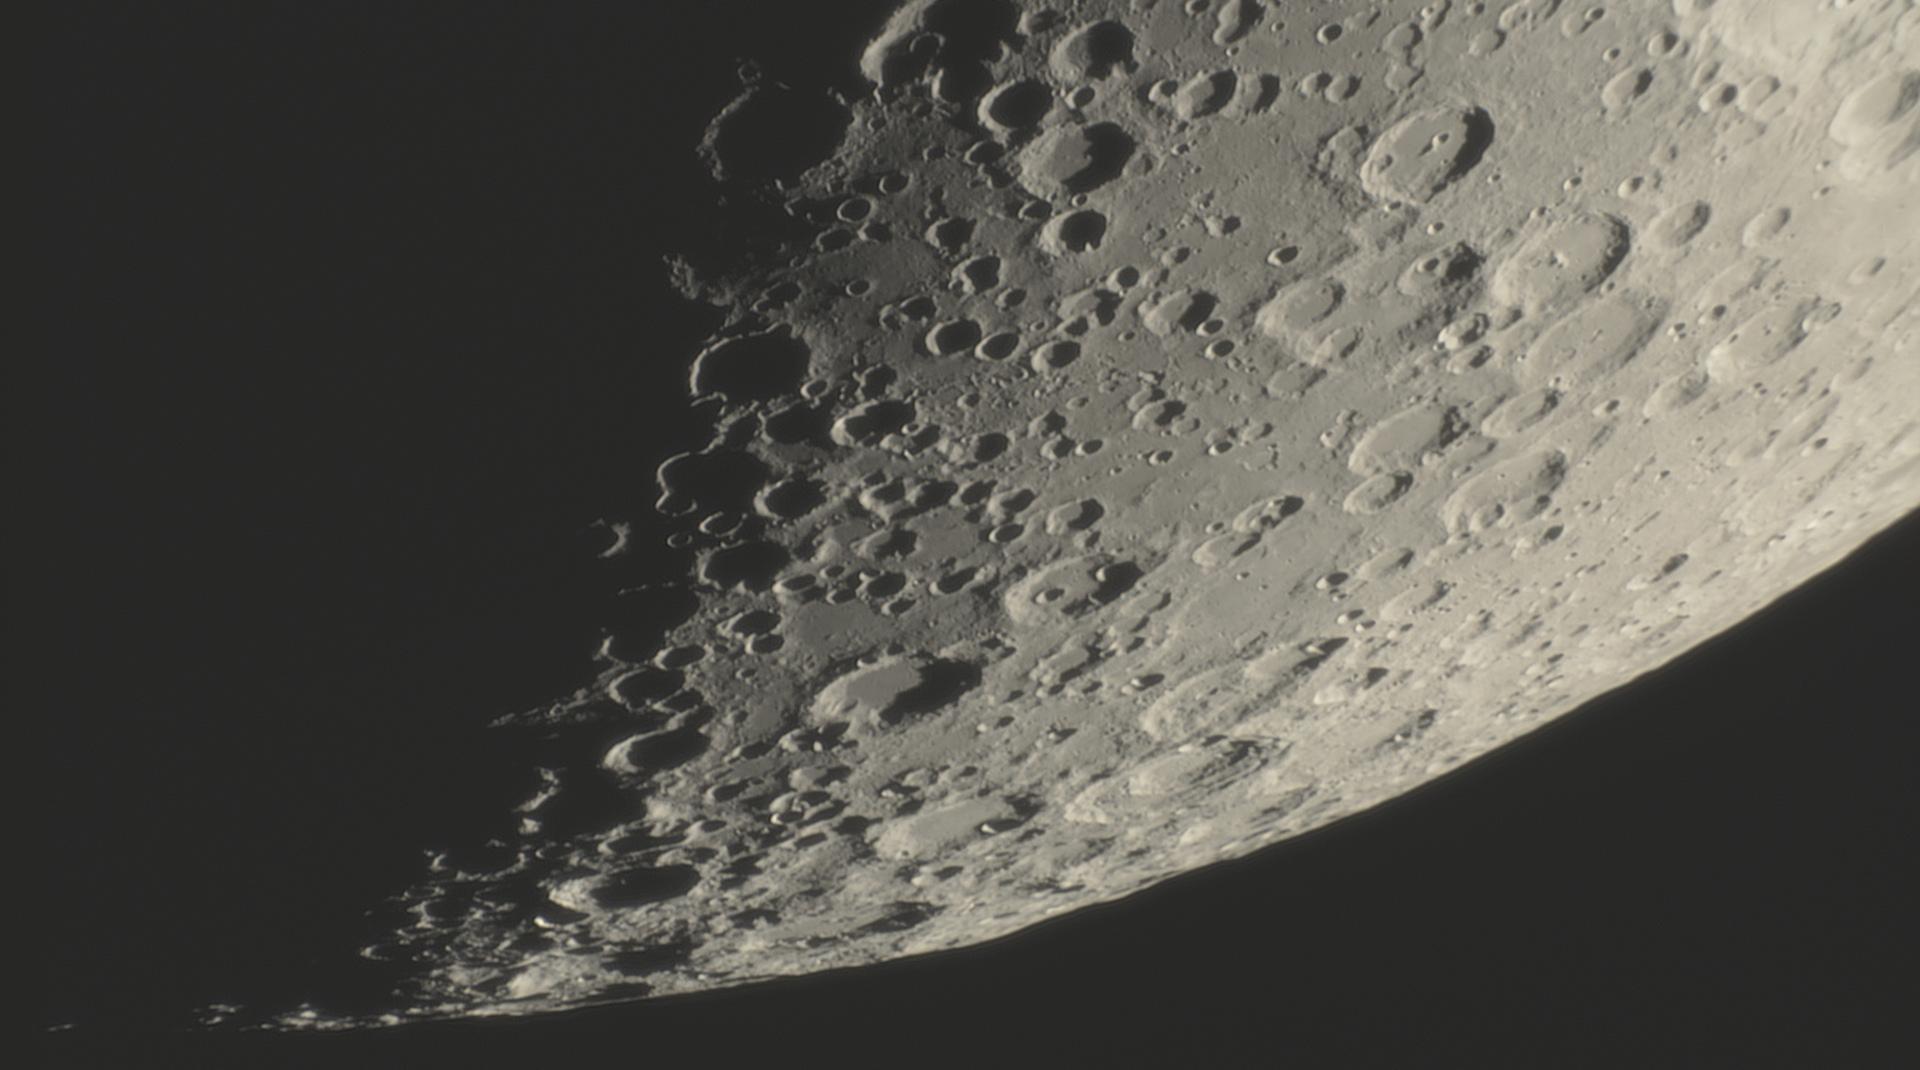 lune19.jpg.93f9054ca7f0c29c3003855916dce49b.jpg